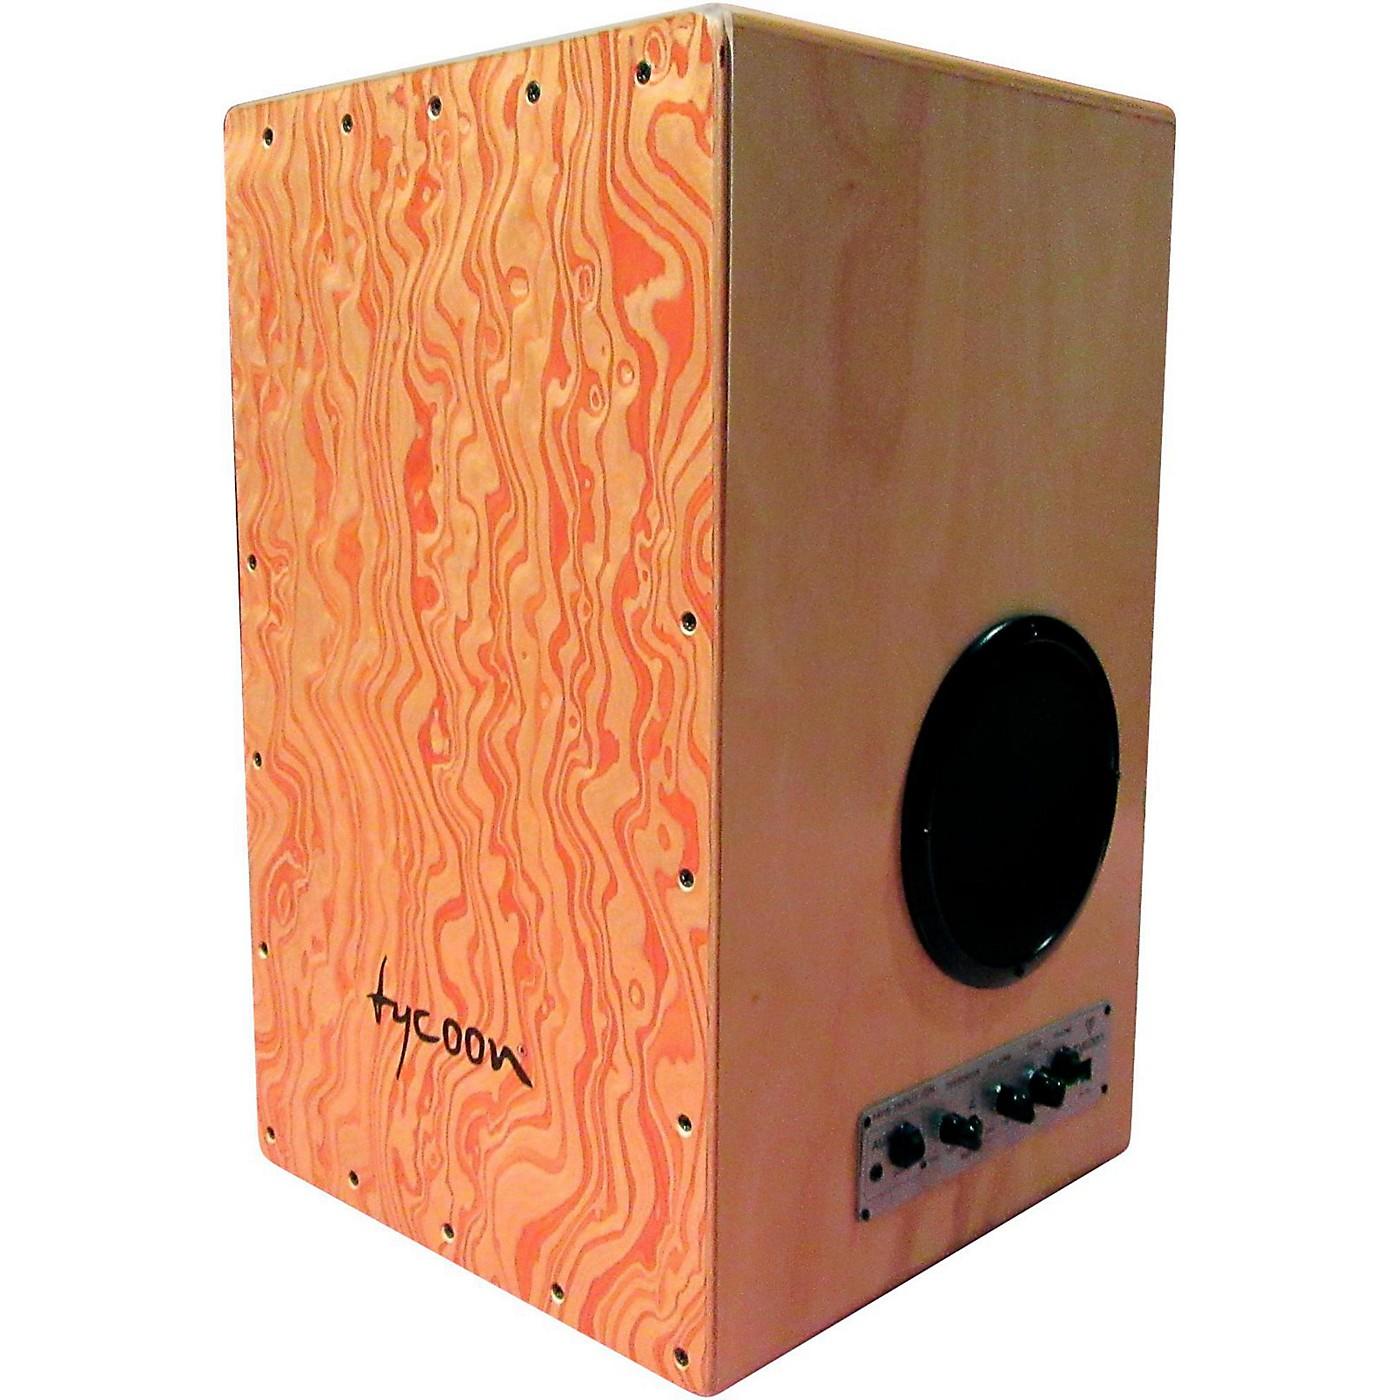 Tycoon Percussion 29 Series Gig Box Amplifier Cajon thumbnail